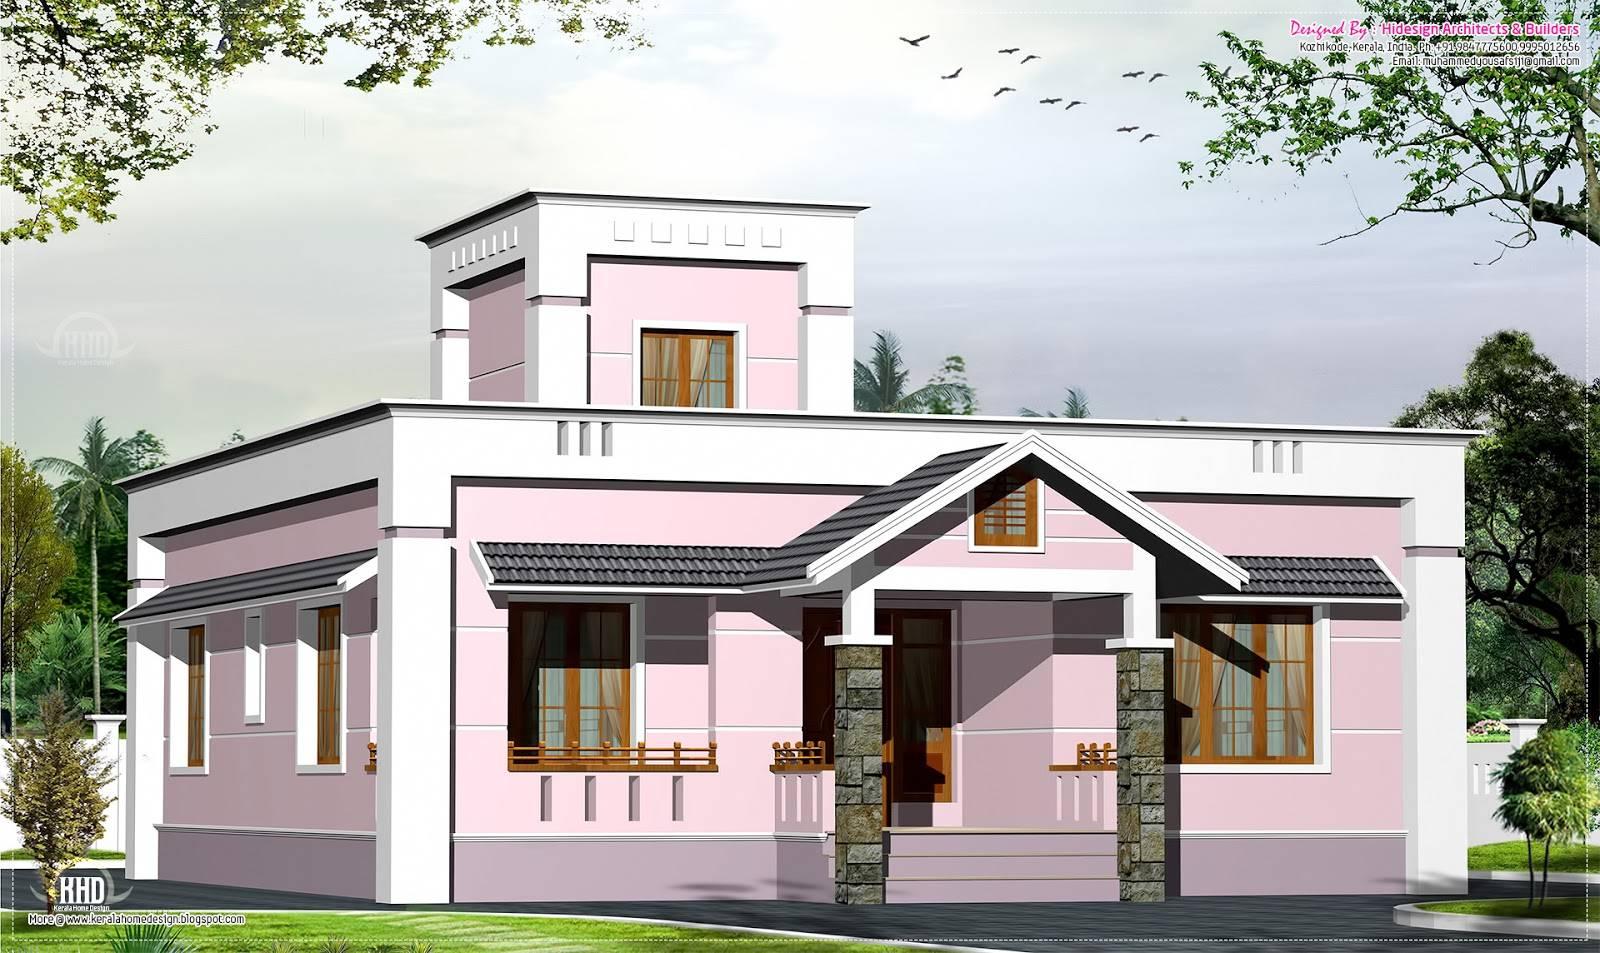 Eco Friendly Houses Feet Small Budget Villa Plan House Plans 3722